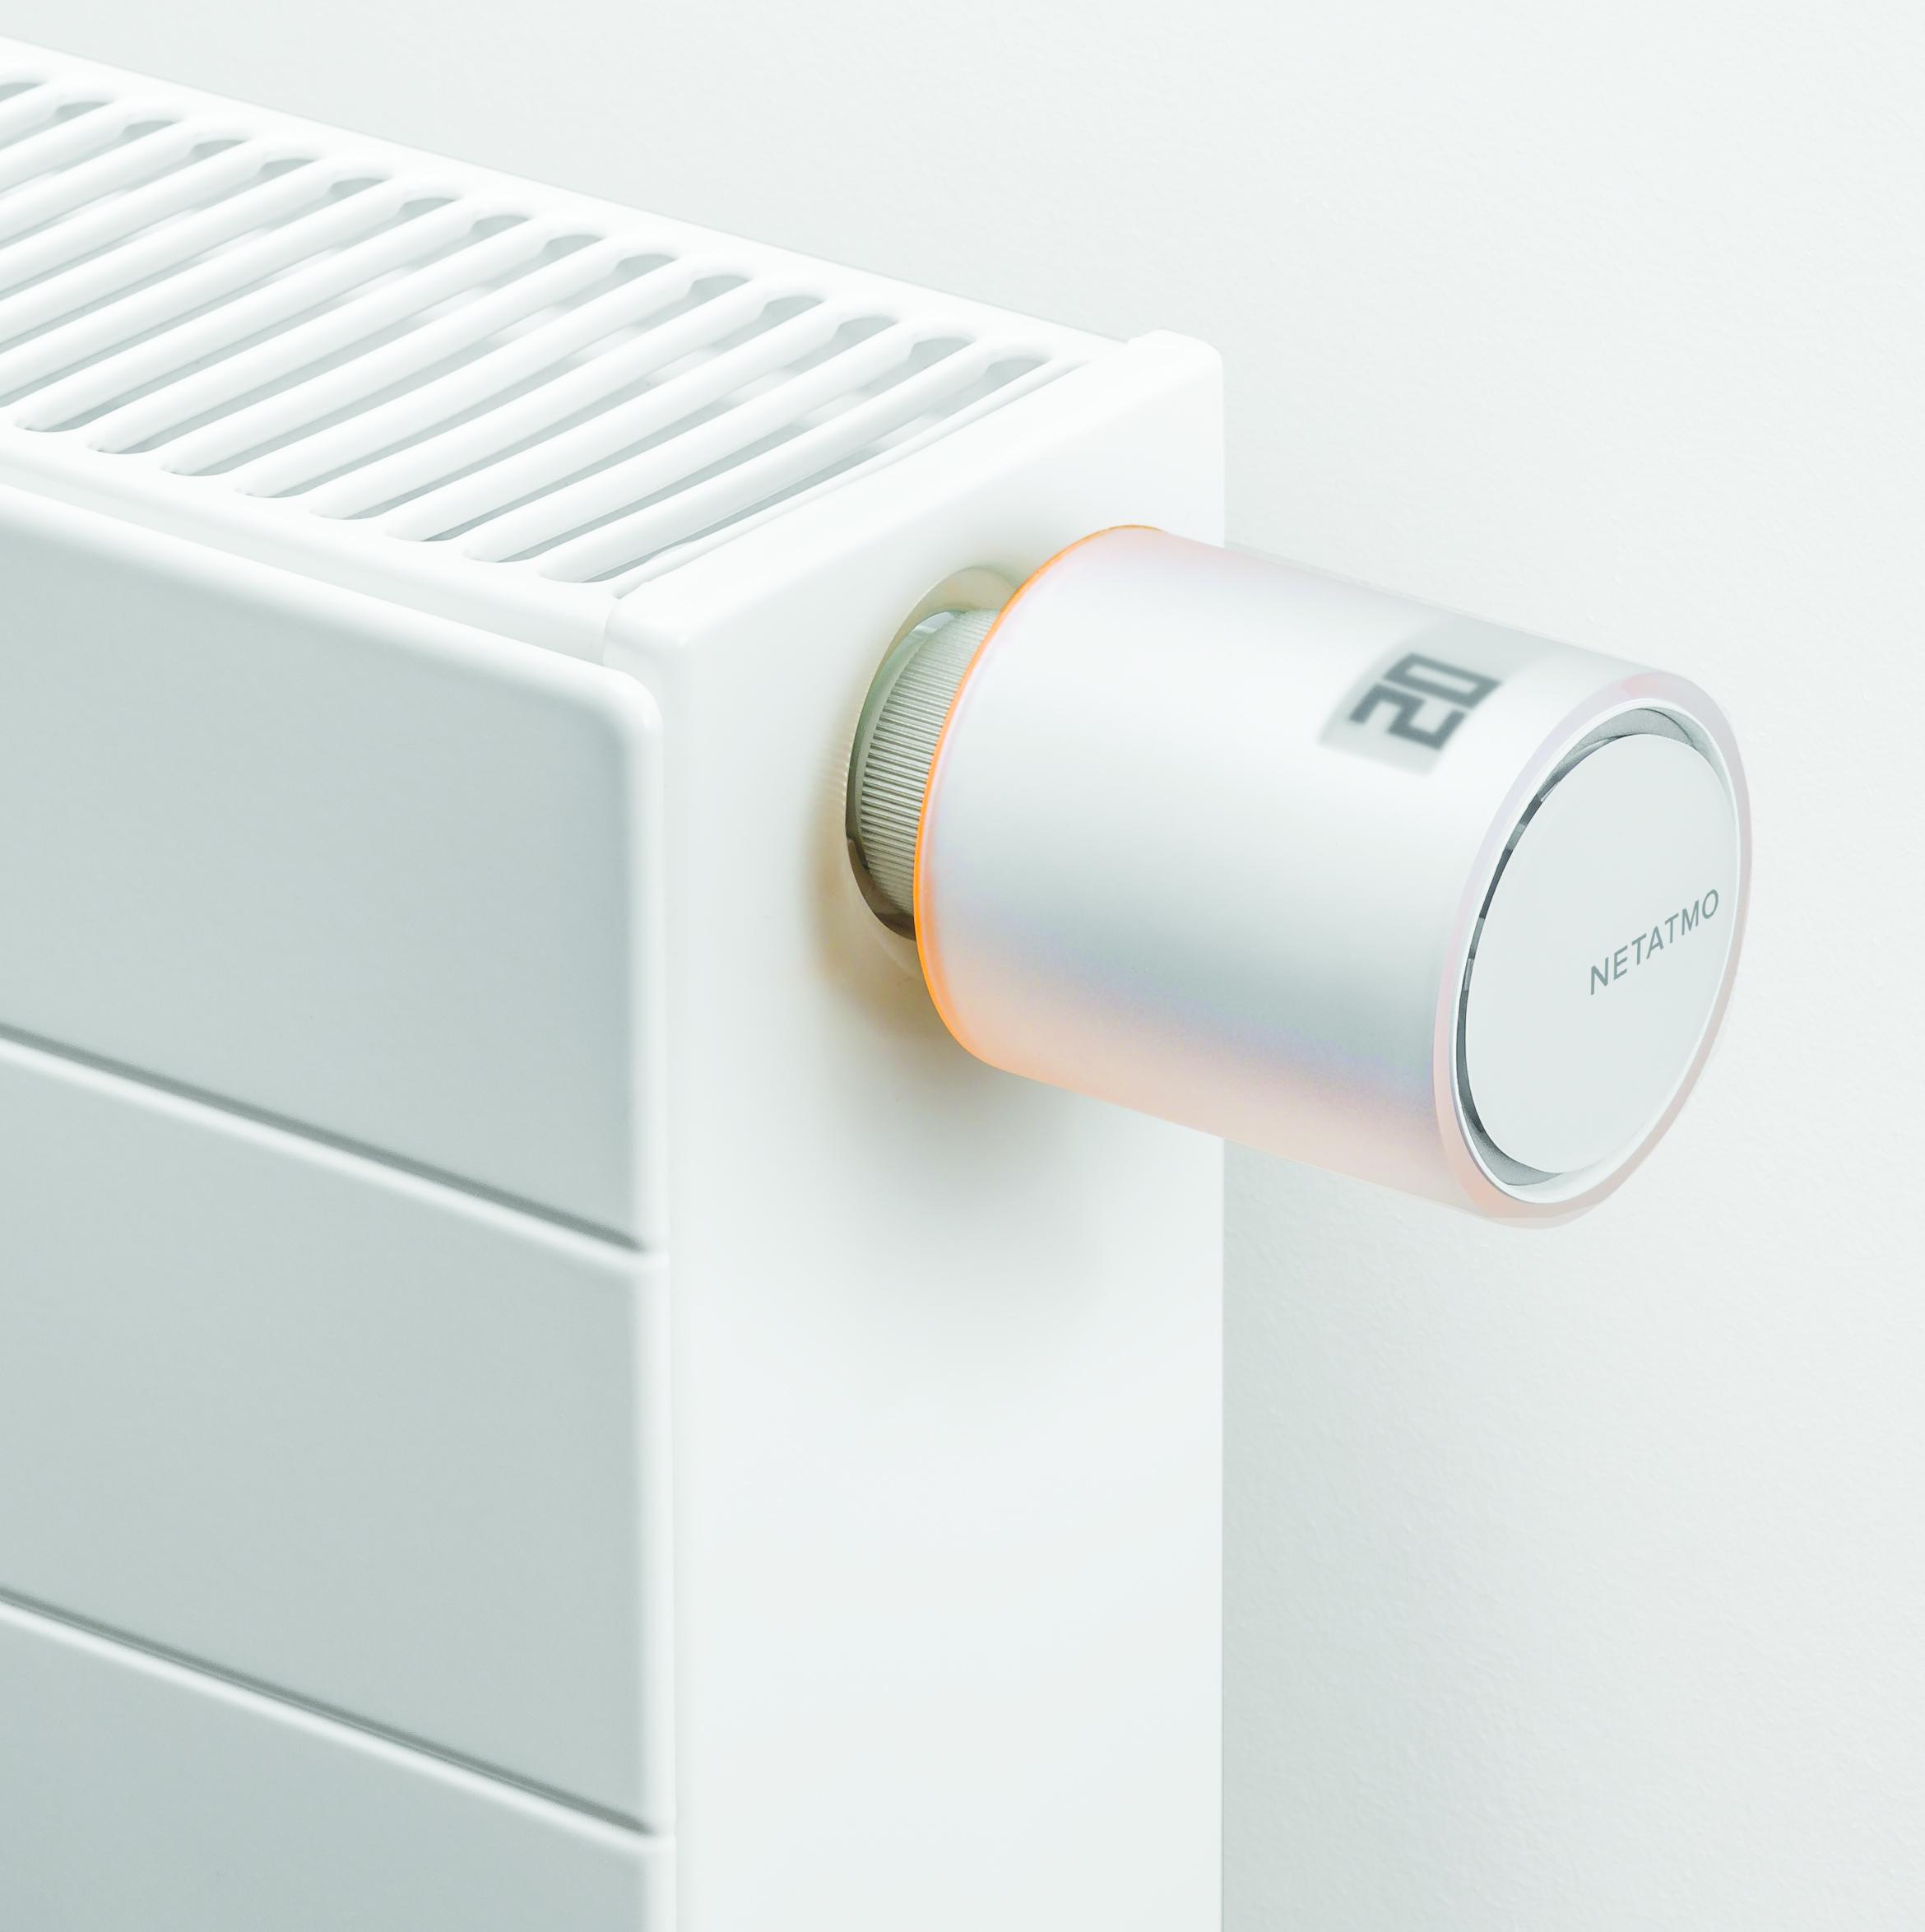 vannes thermostat radiateur cmjn - Radiateur Avec Robinet Thermostatique